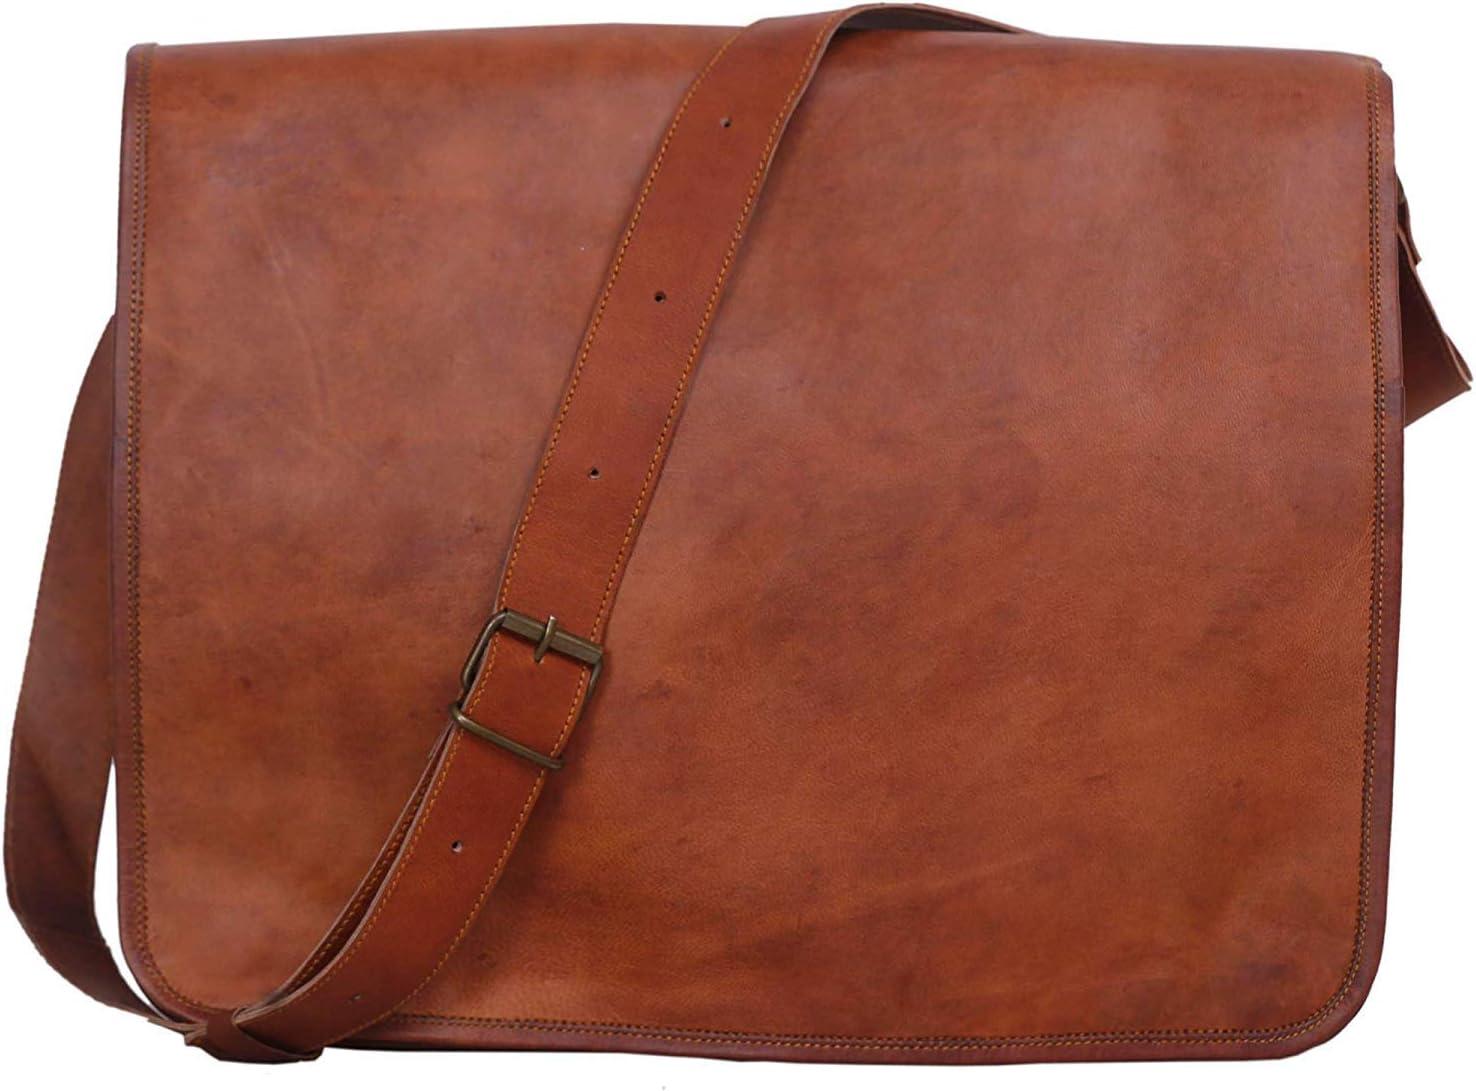 KPL 18 INCH Leather Laptop bag handmade messenger bags satchel for men and women (18 INCH)